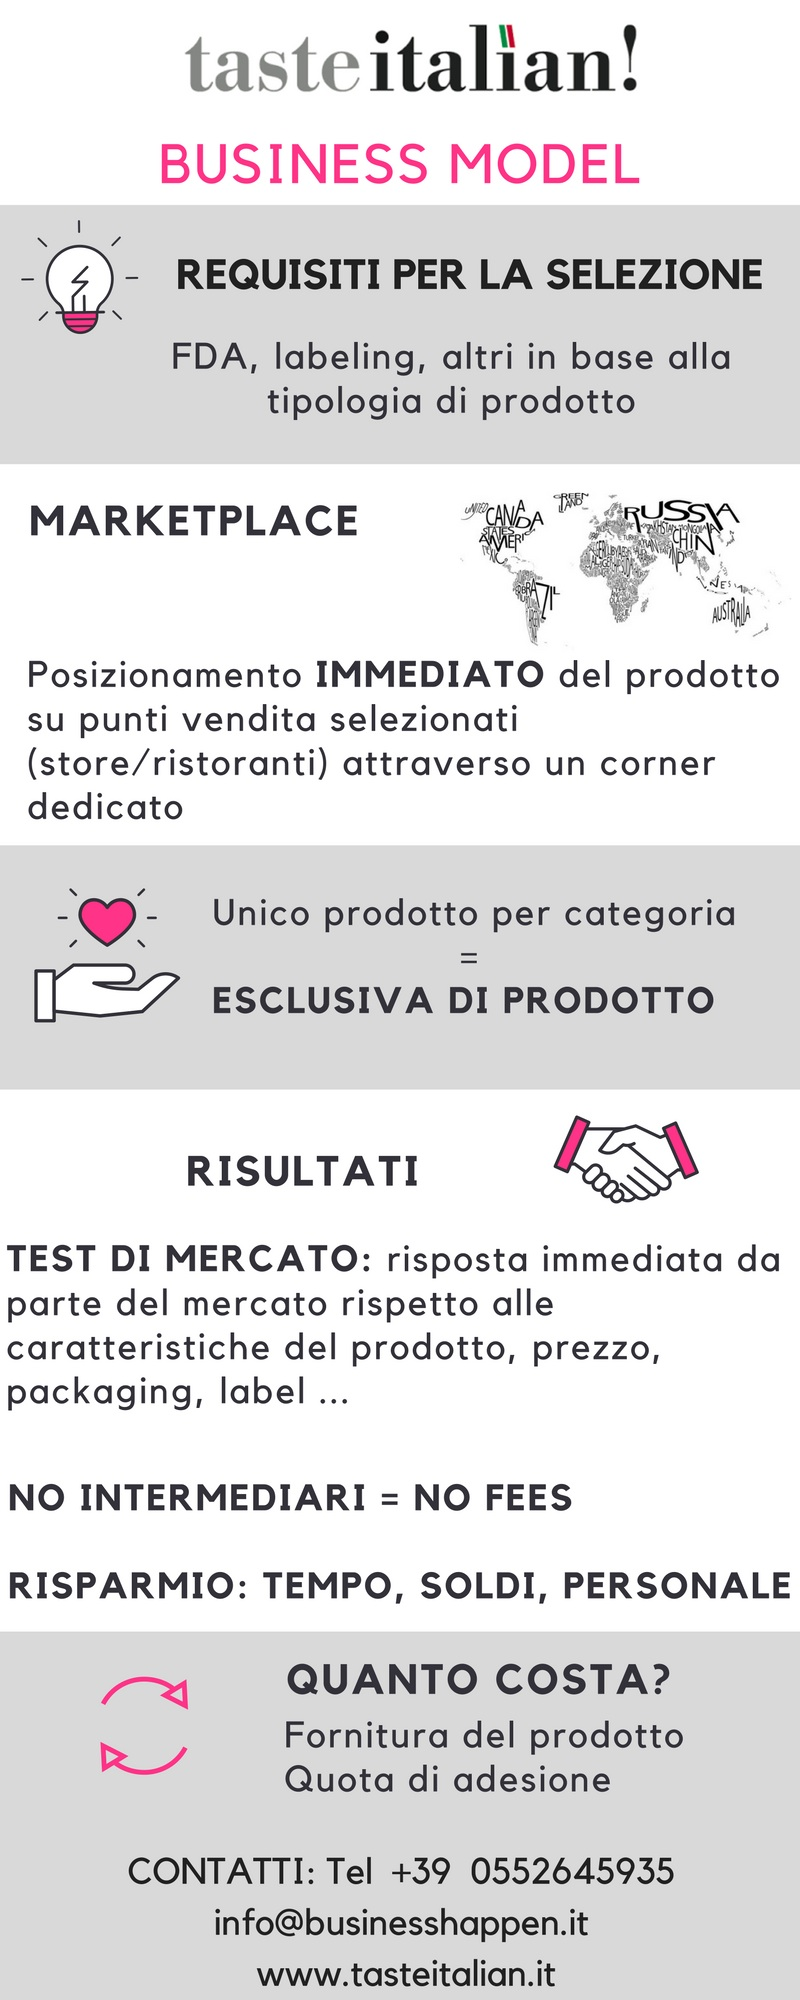 tasteitalianil-gusto-italiano-per-i-mercati-esteri